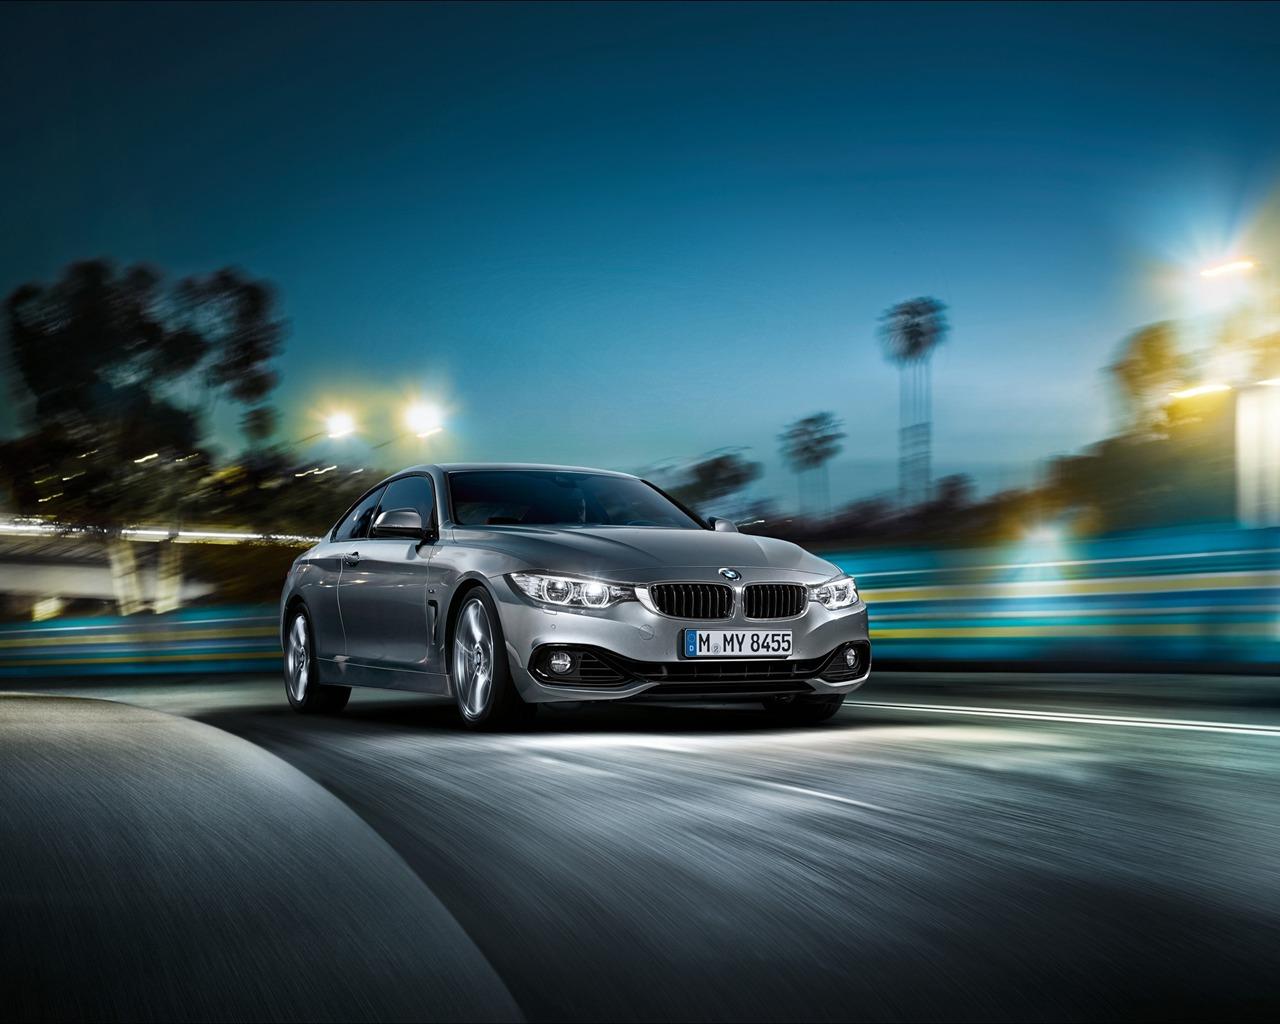 BMW X Series >> 宝马4系Coupe-汽车高清壁纸预览 | 10wallpaper.com